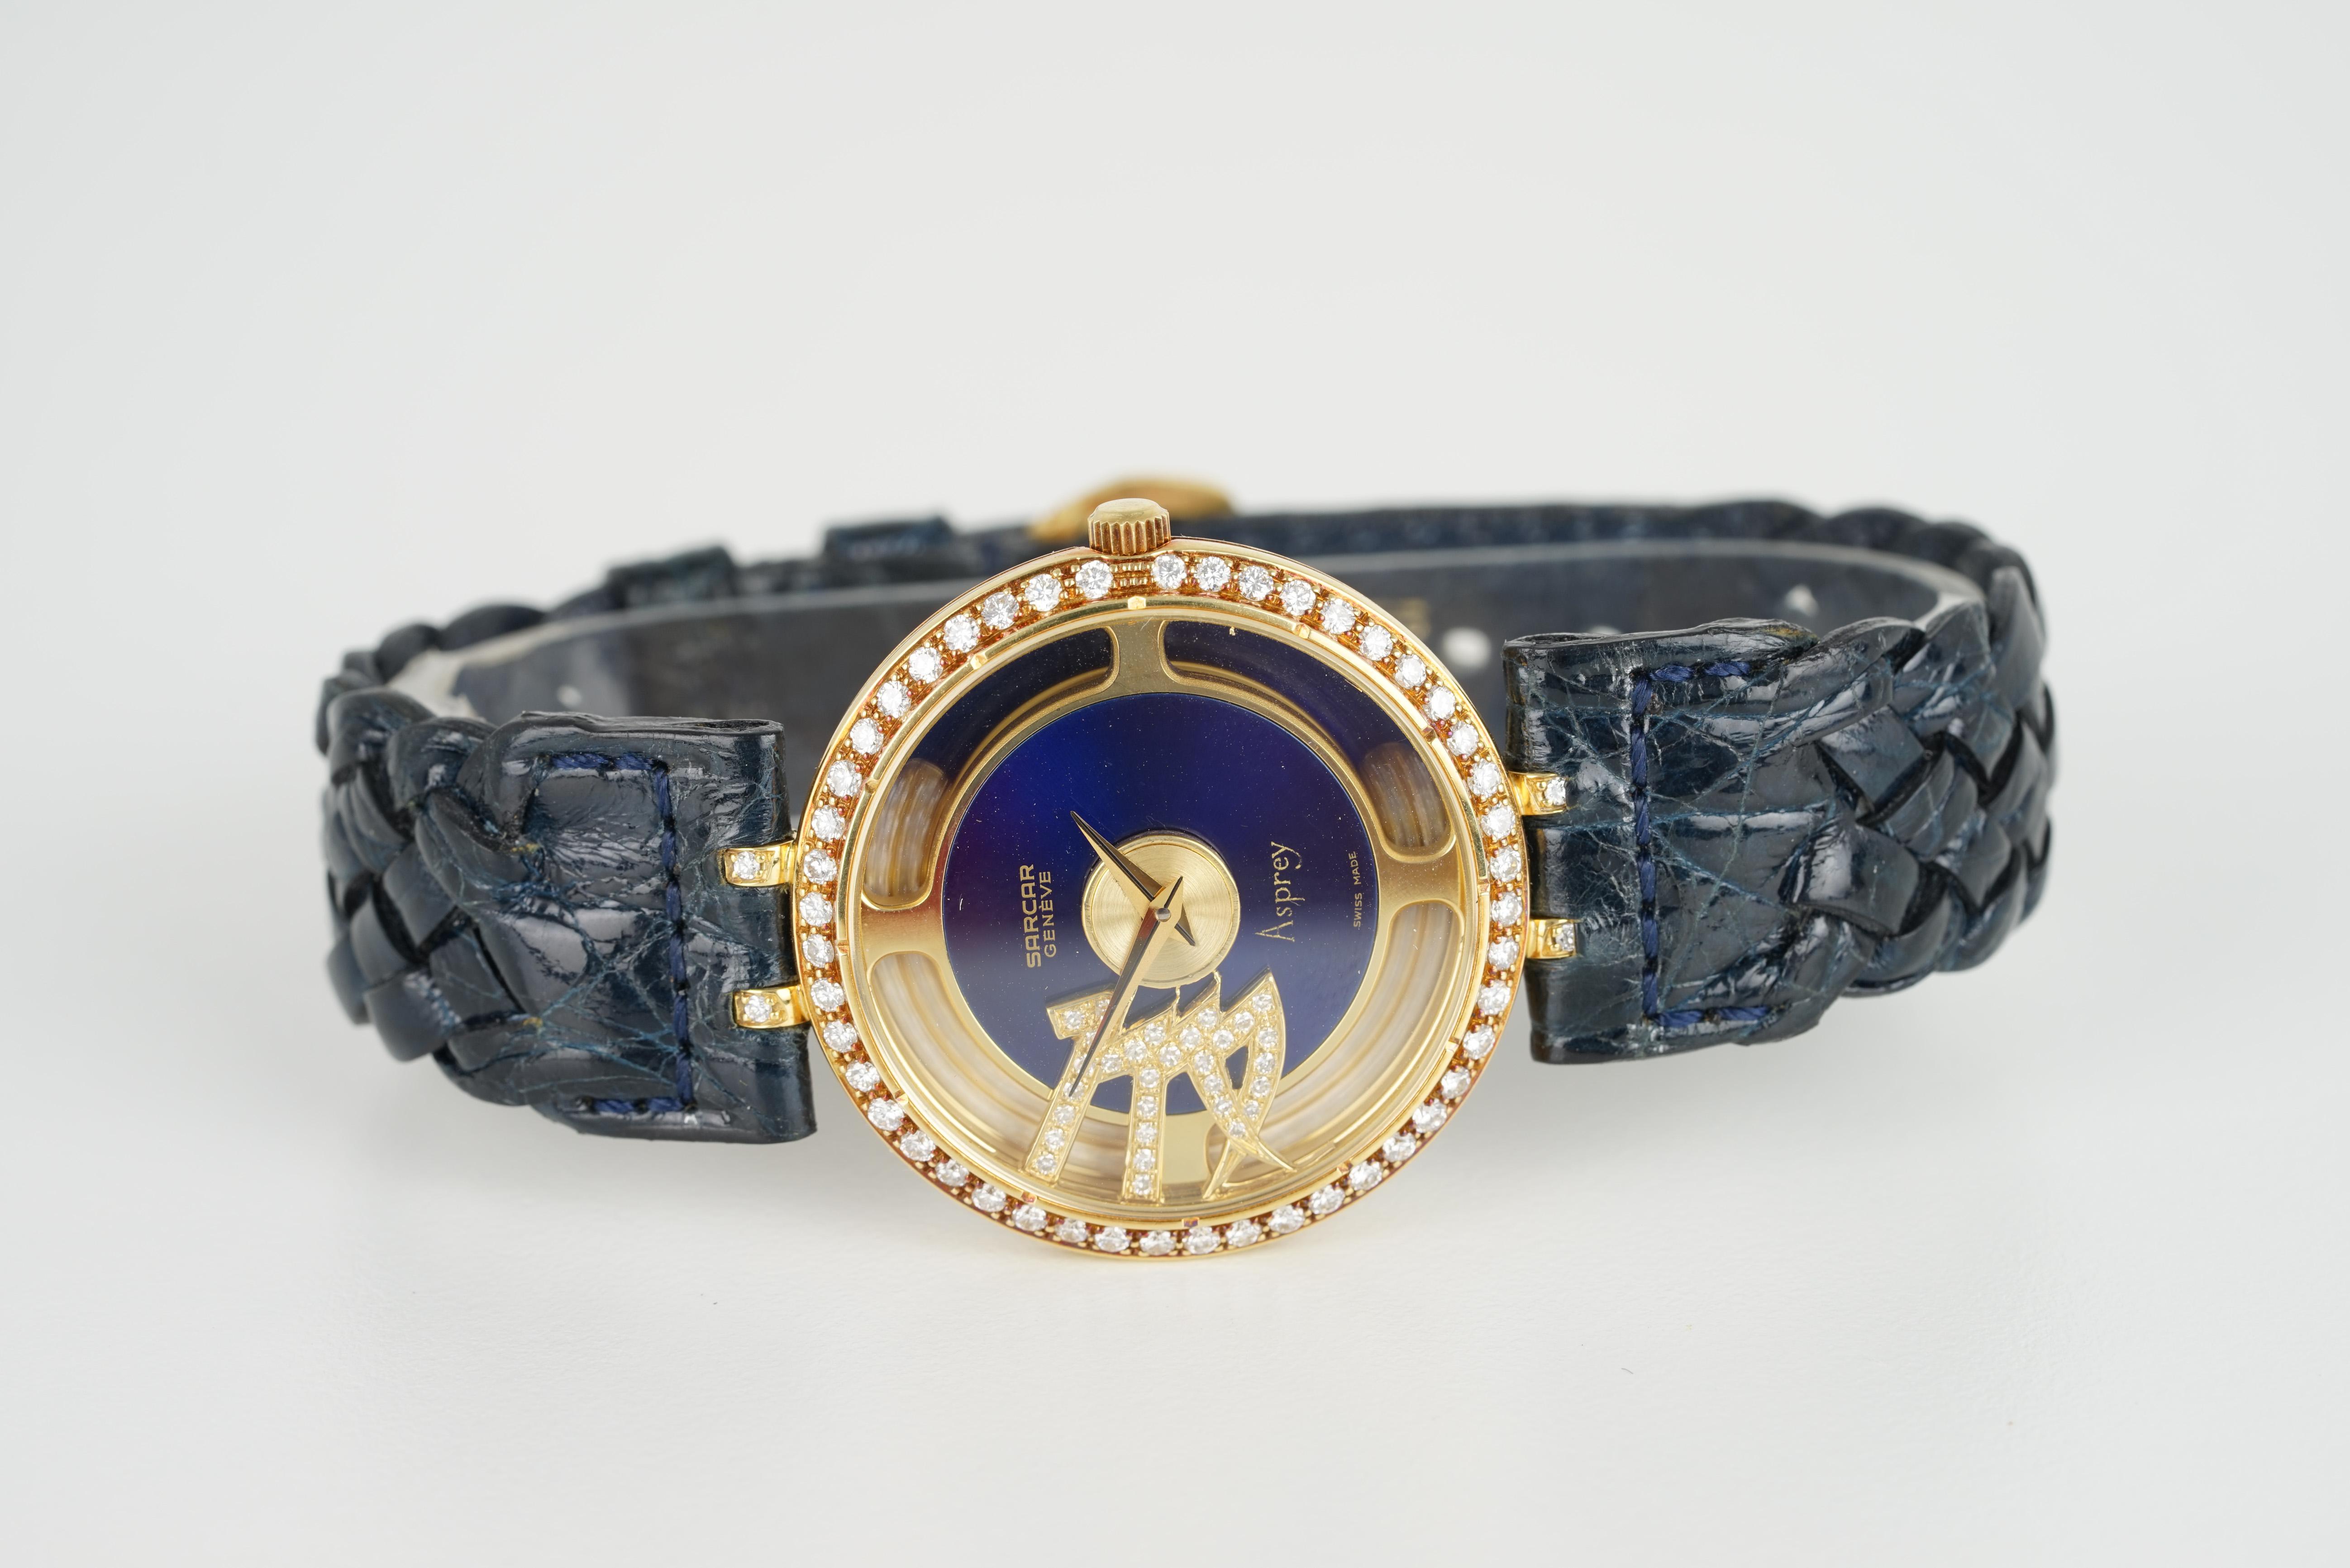 GENTLELMENS SARCAR GENEVE ASPREY 18CT GOLD DIAMOND SET WRISTWATCH, circular dial with dauphine - Image 2 of 3